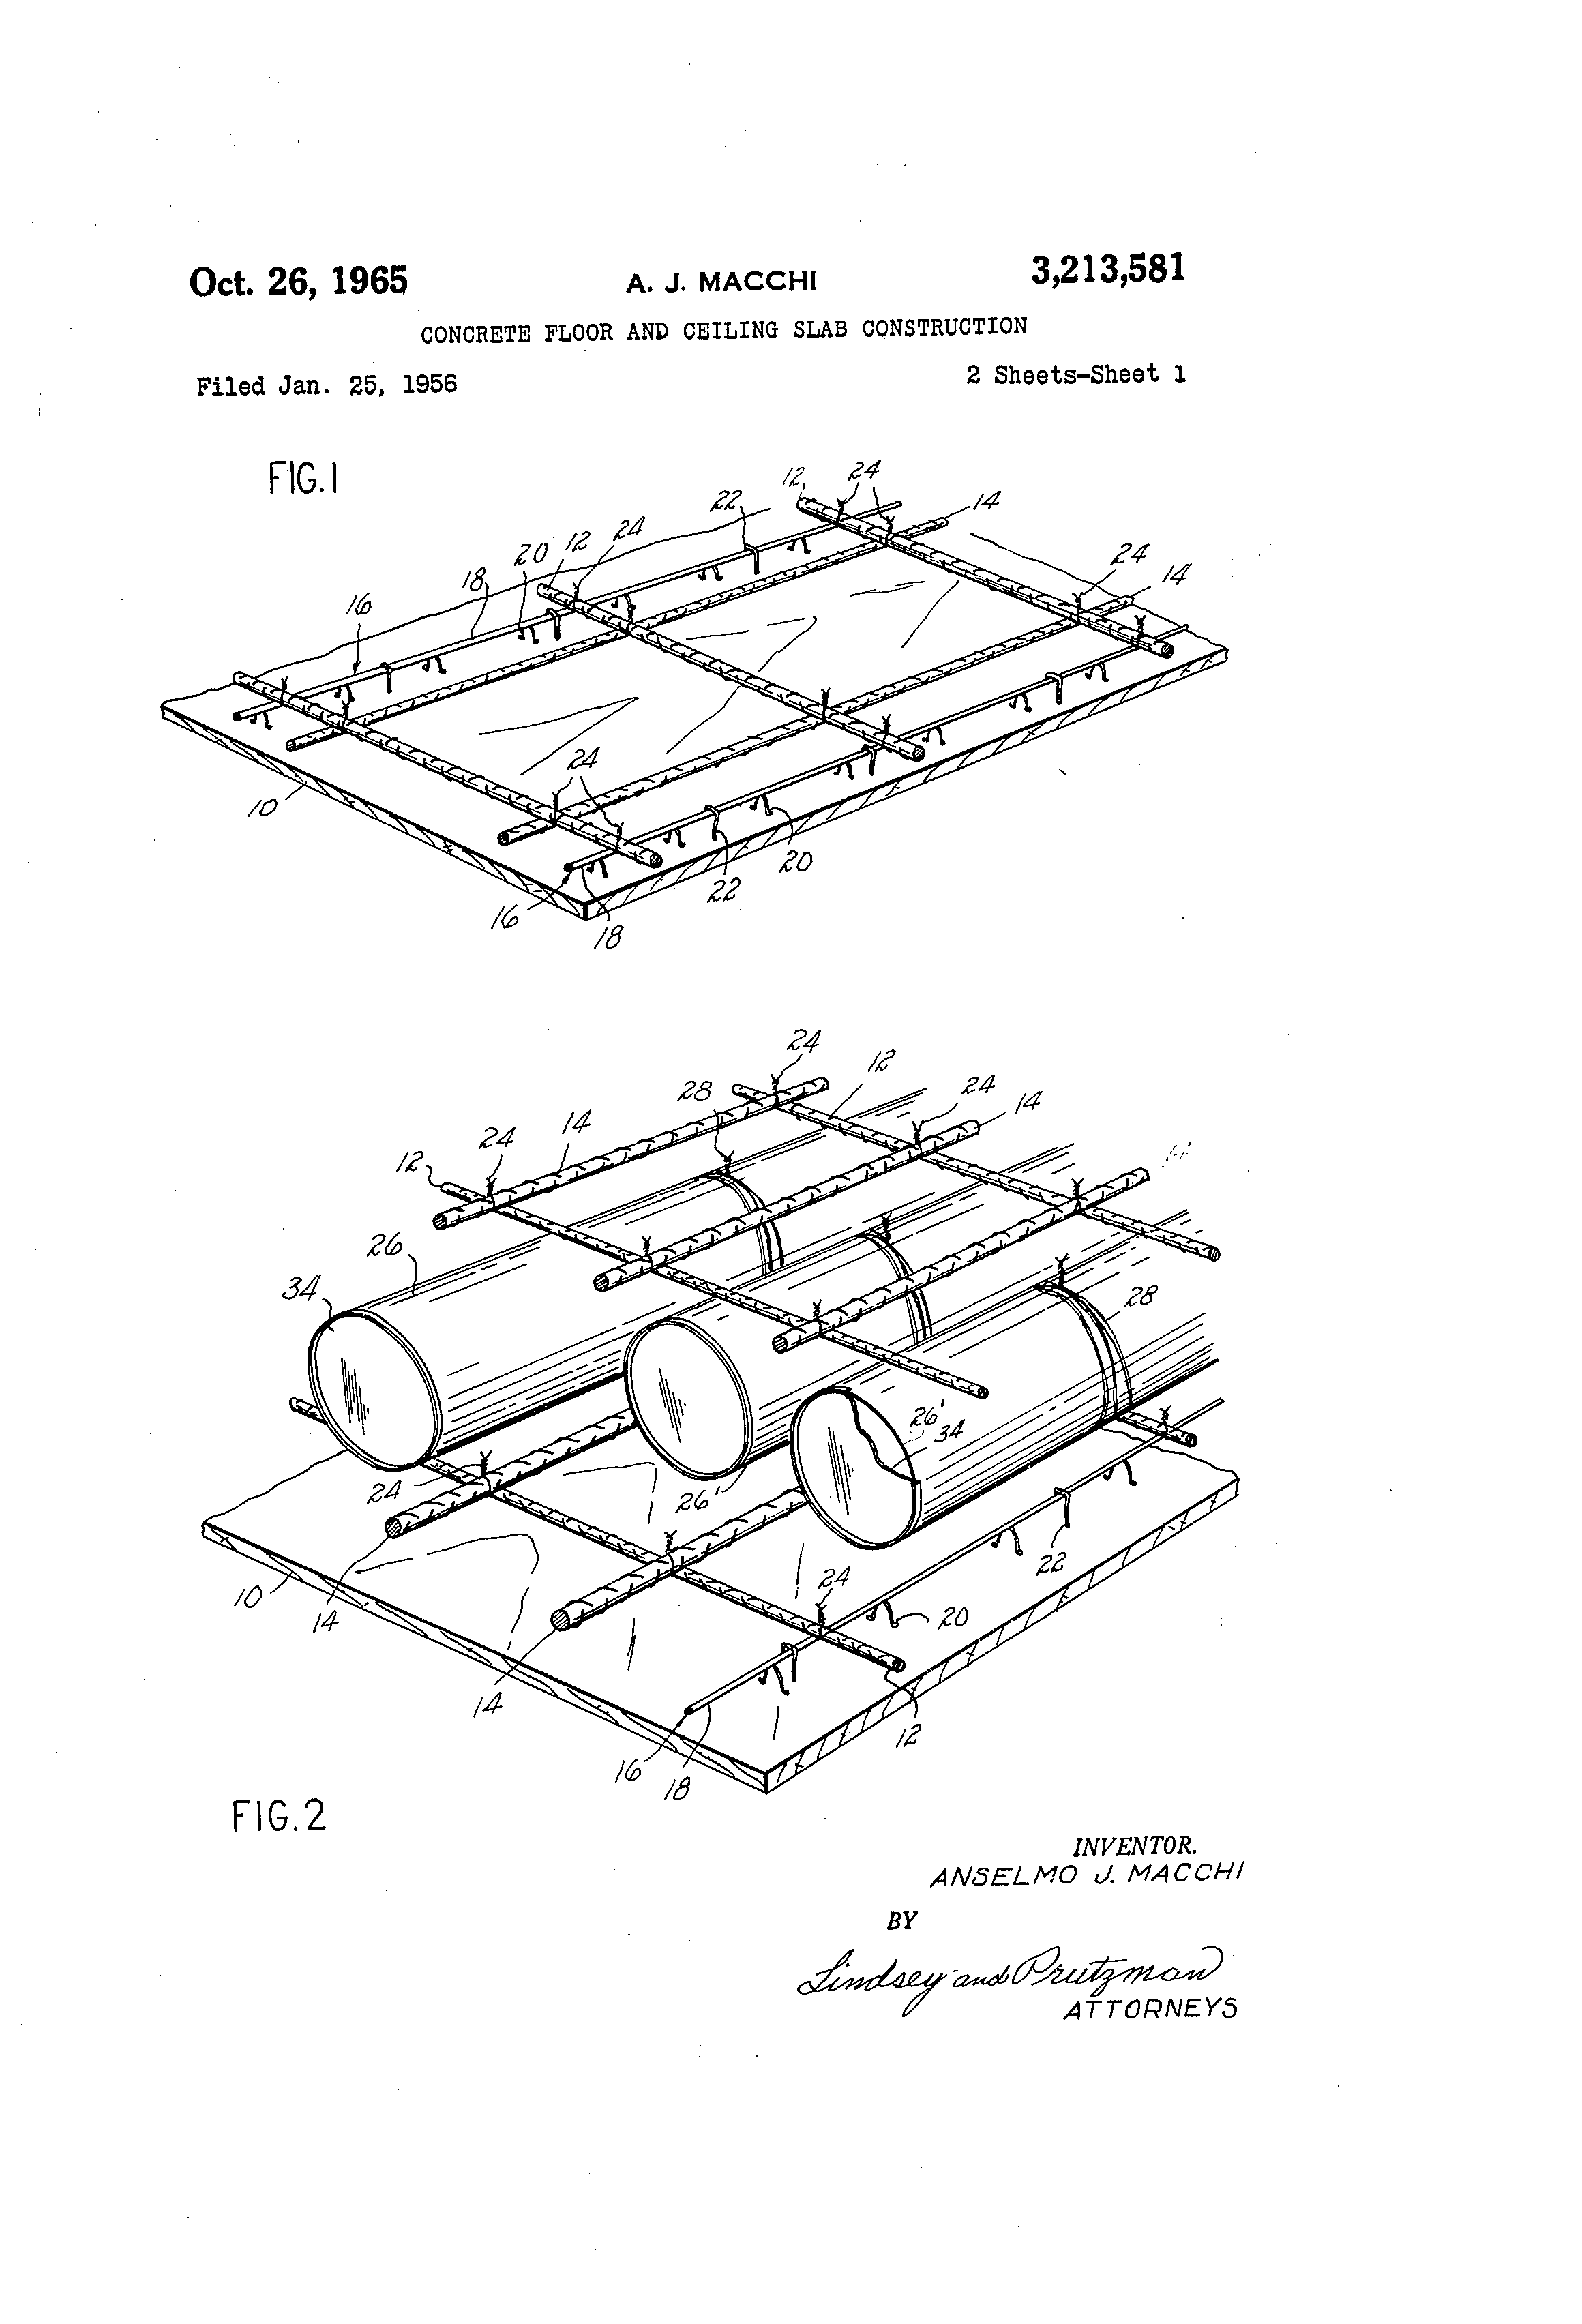 Brevet US3213581 - Concrete floor and ceiling slab